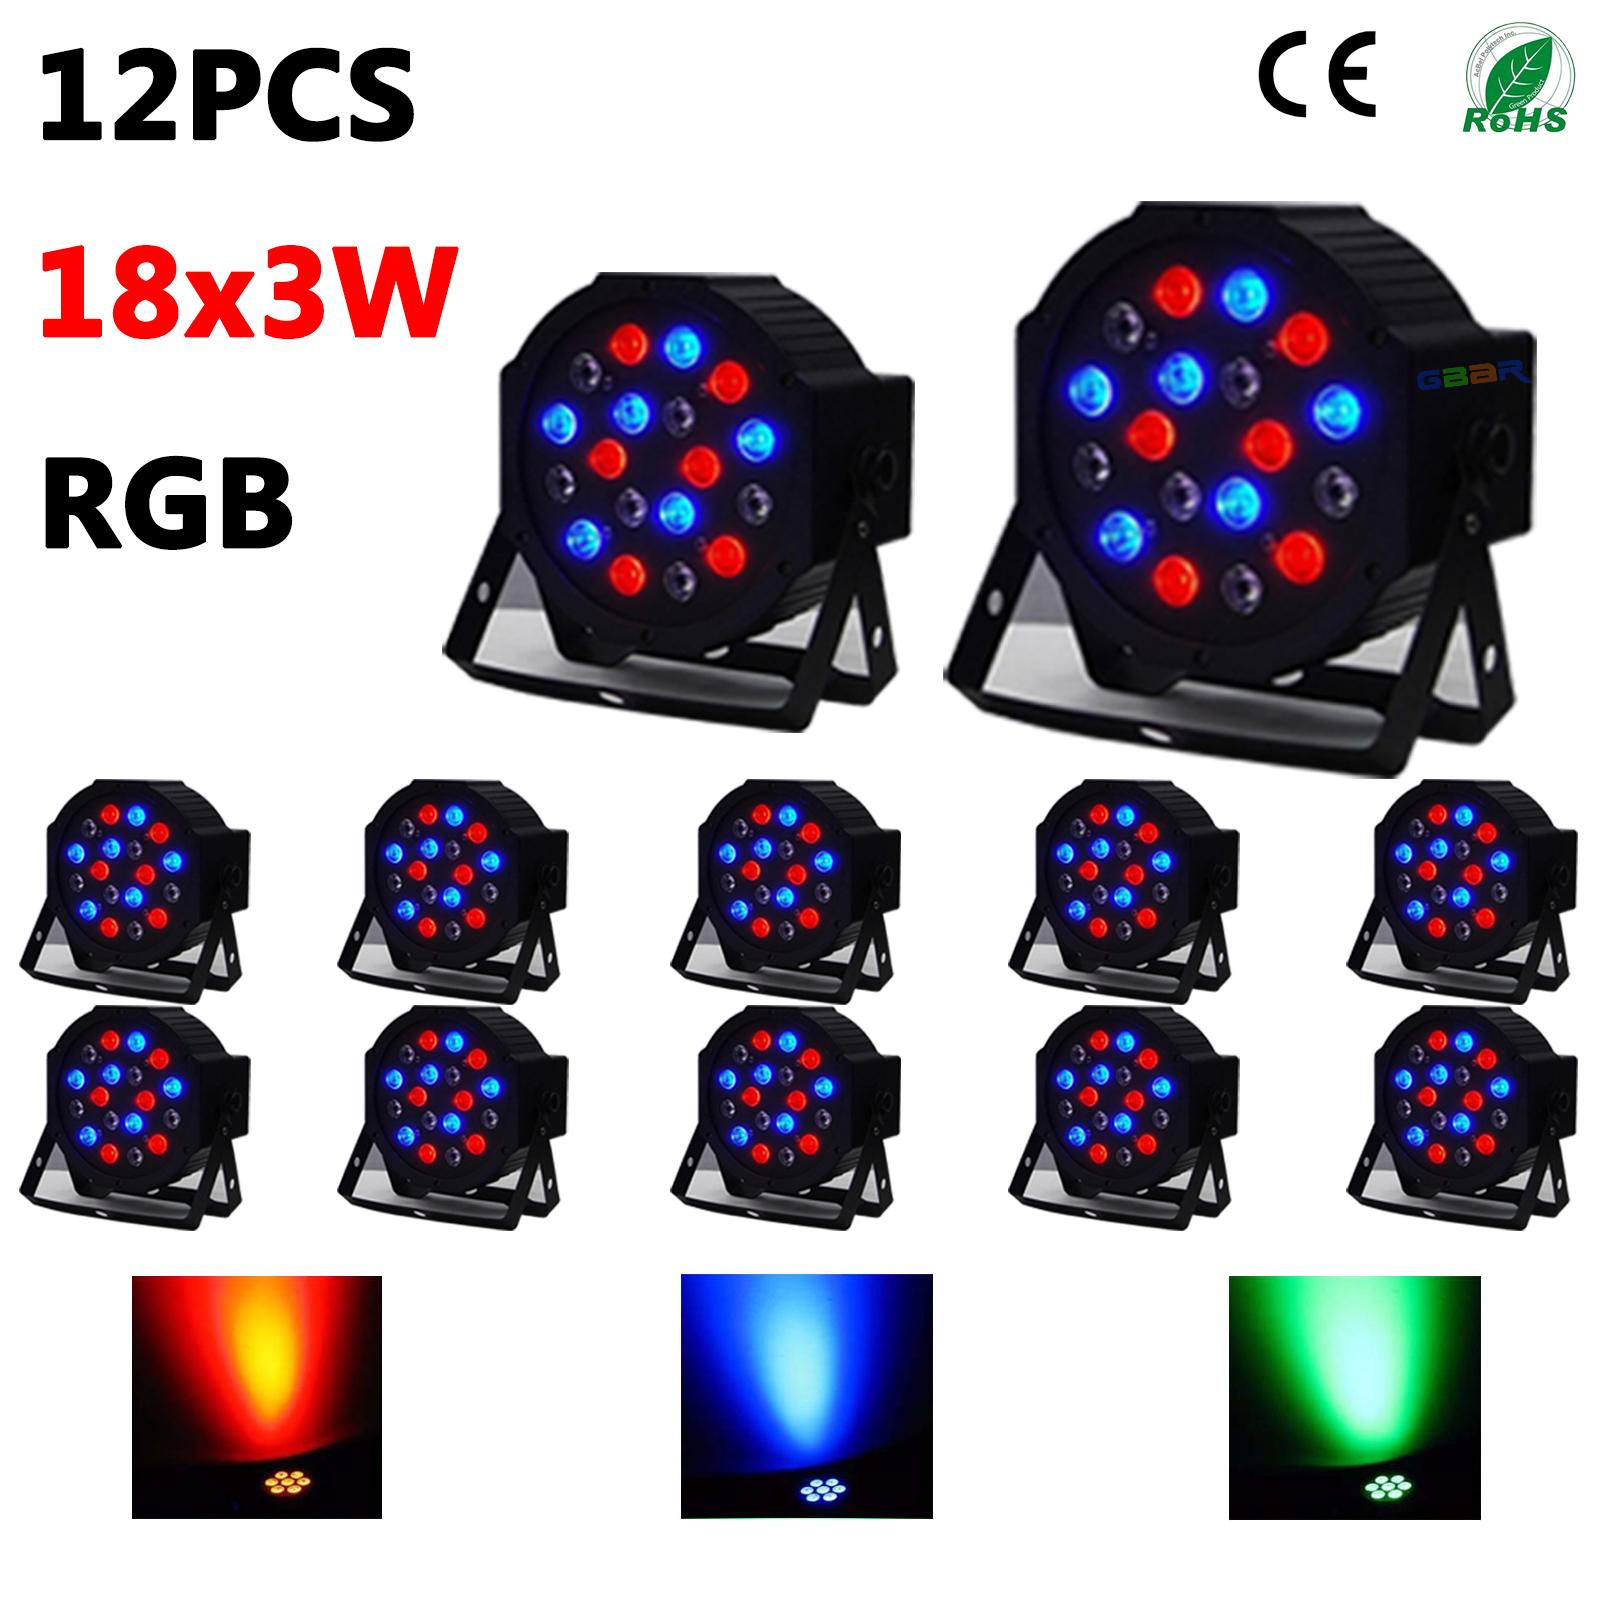 12PCS 18X3W Stage DMX 512 RGB LED PAR LIGHT For DISCO Party 54W +FEDEX SHIPPING Item NO 372352  sc 1 st  gbar led light bar & US$ 133.99 - 12PCS 18X3W Stage DMX 512 RGB LED PAR LIGHT For DISCO ... azcodes.com